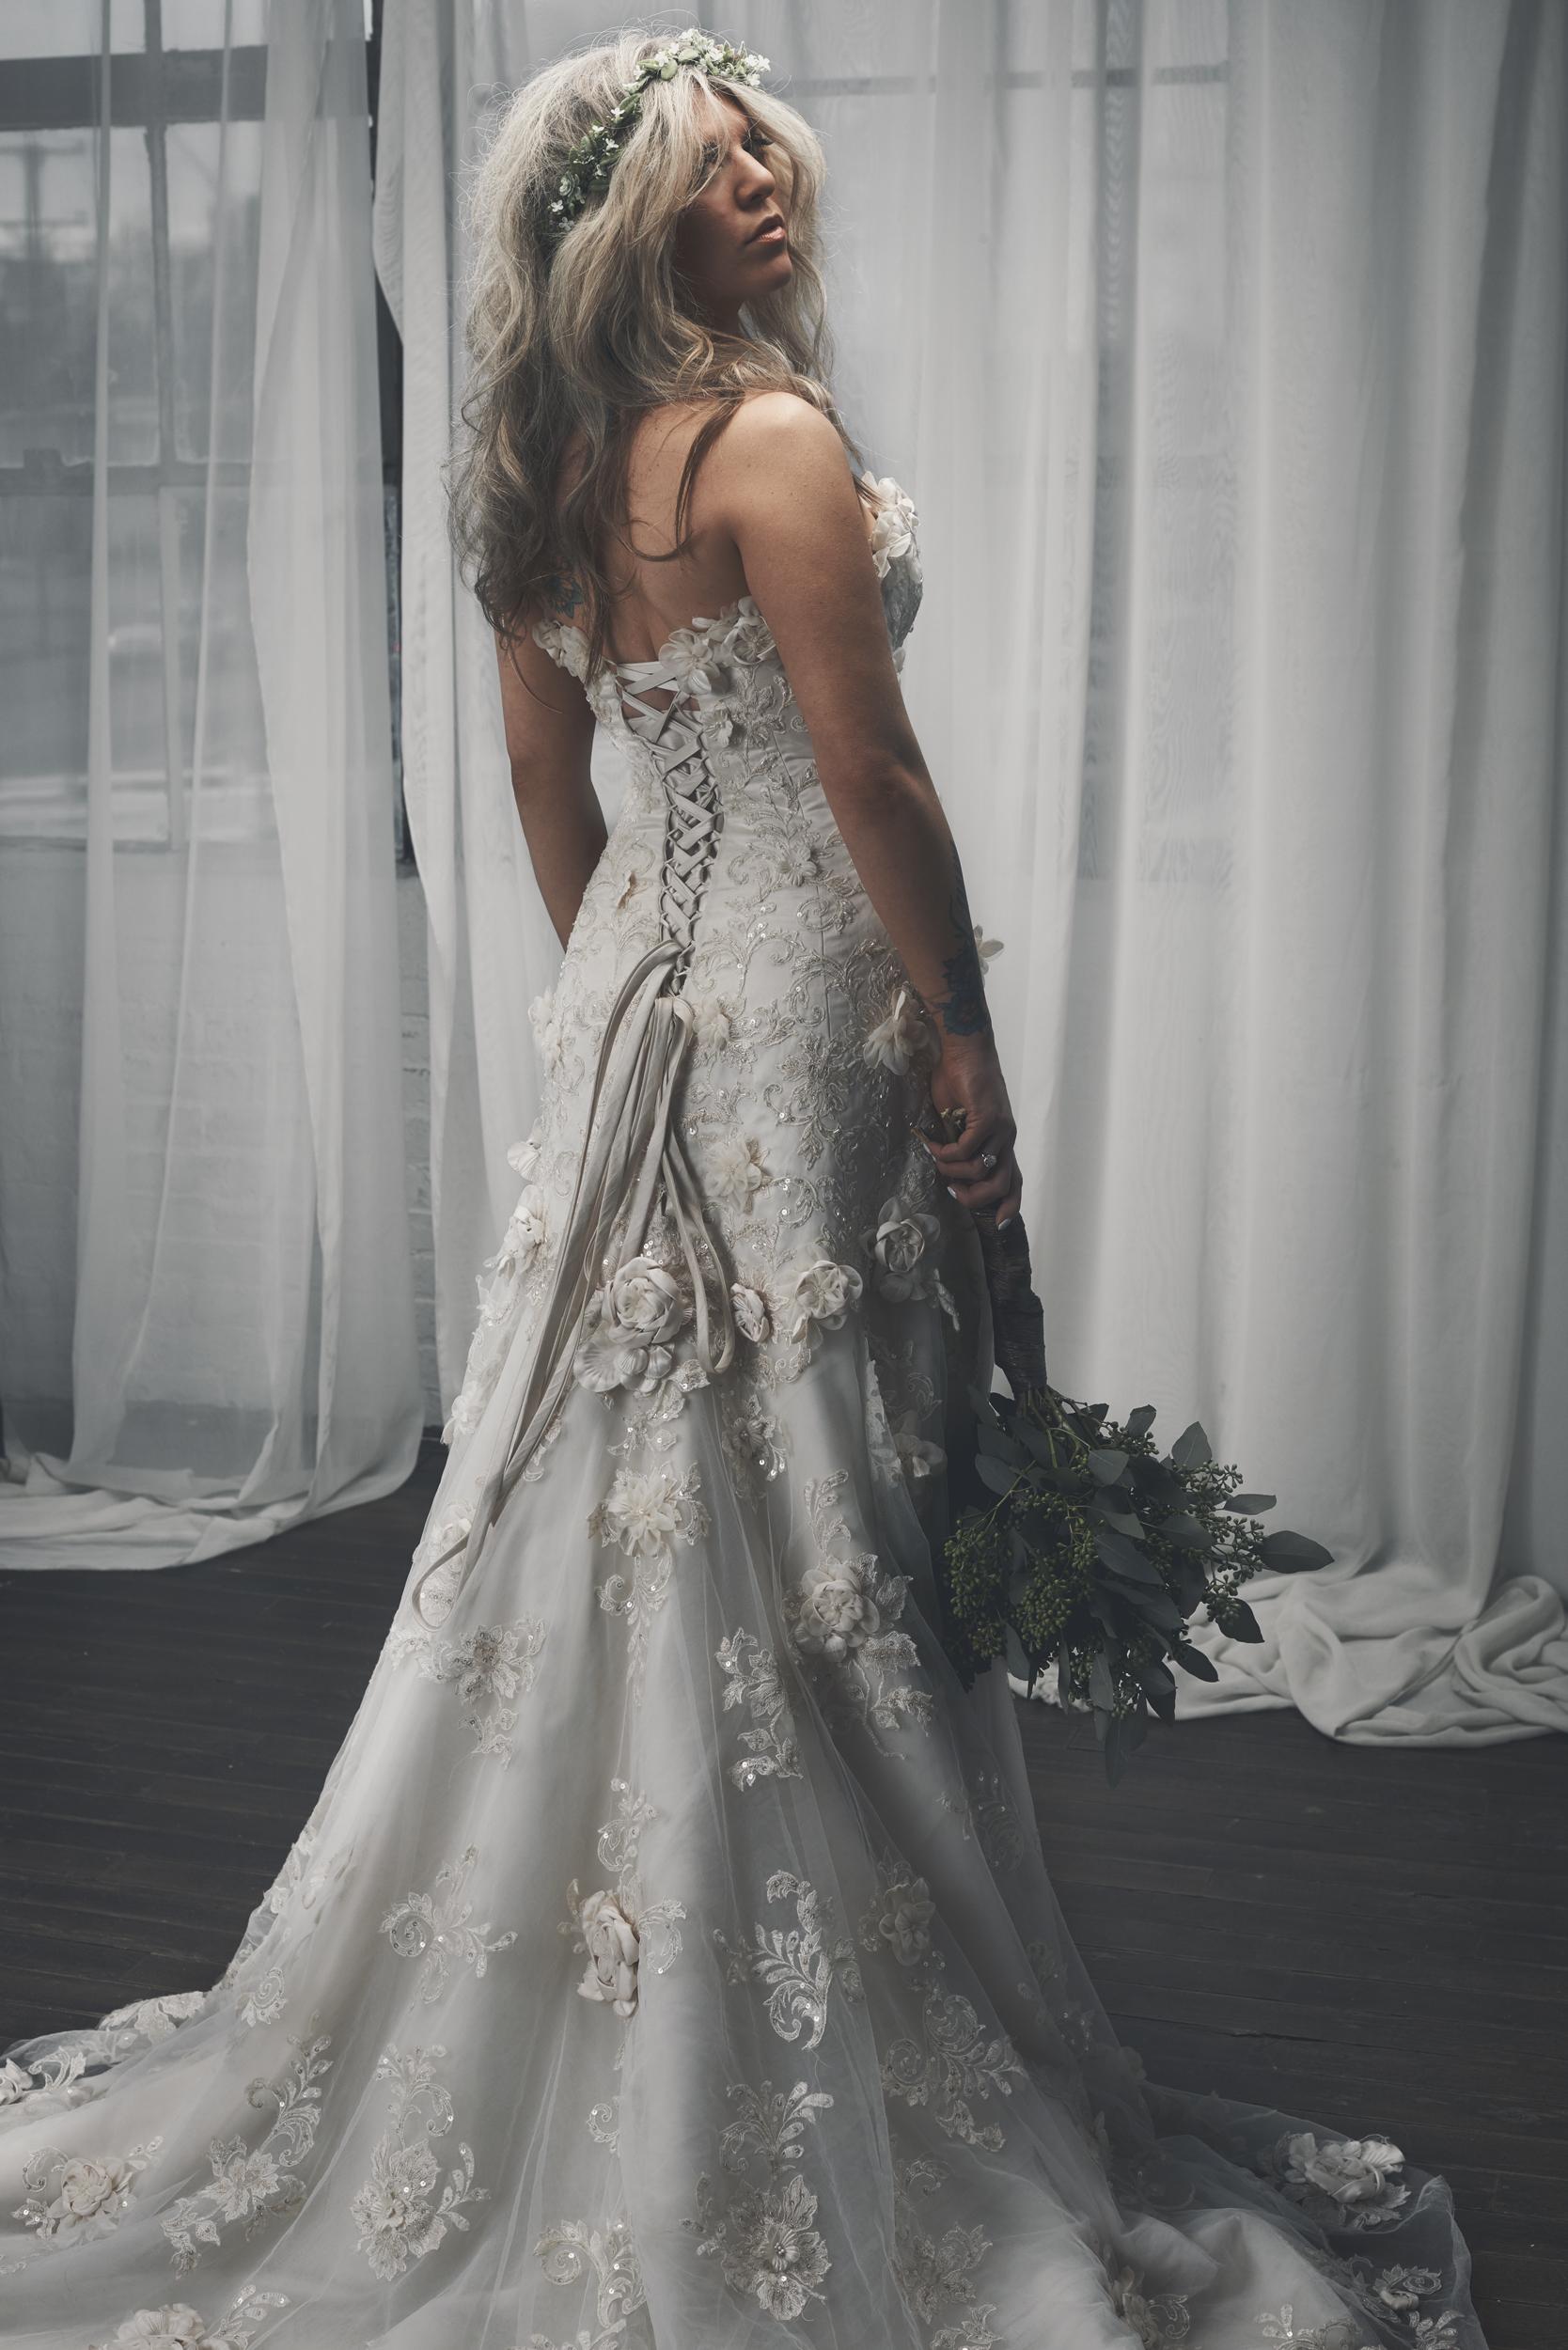 New England Luxury Bride Fashion